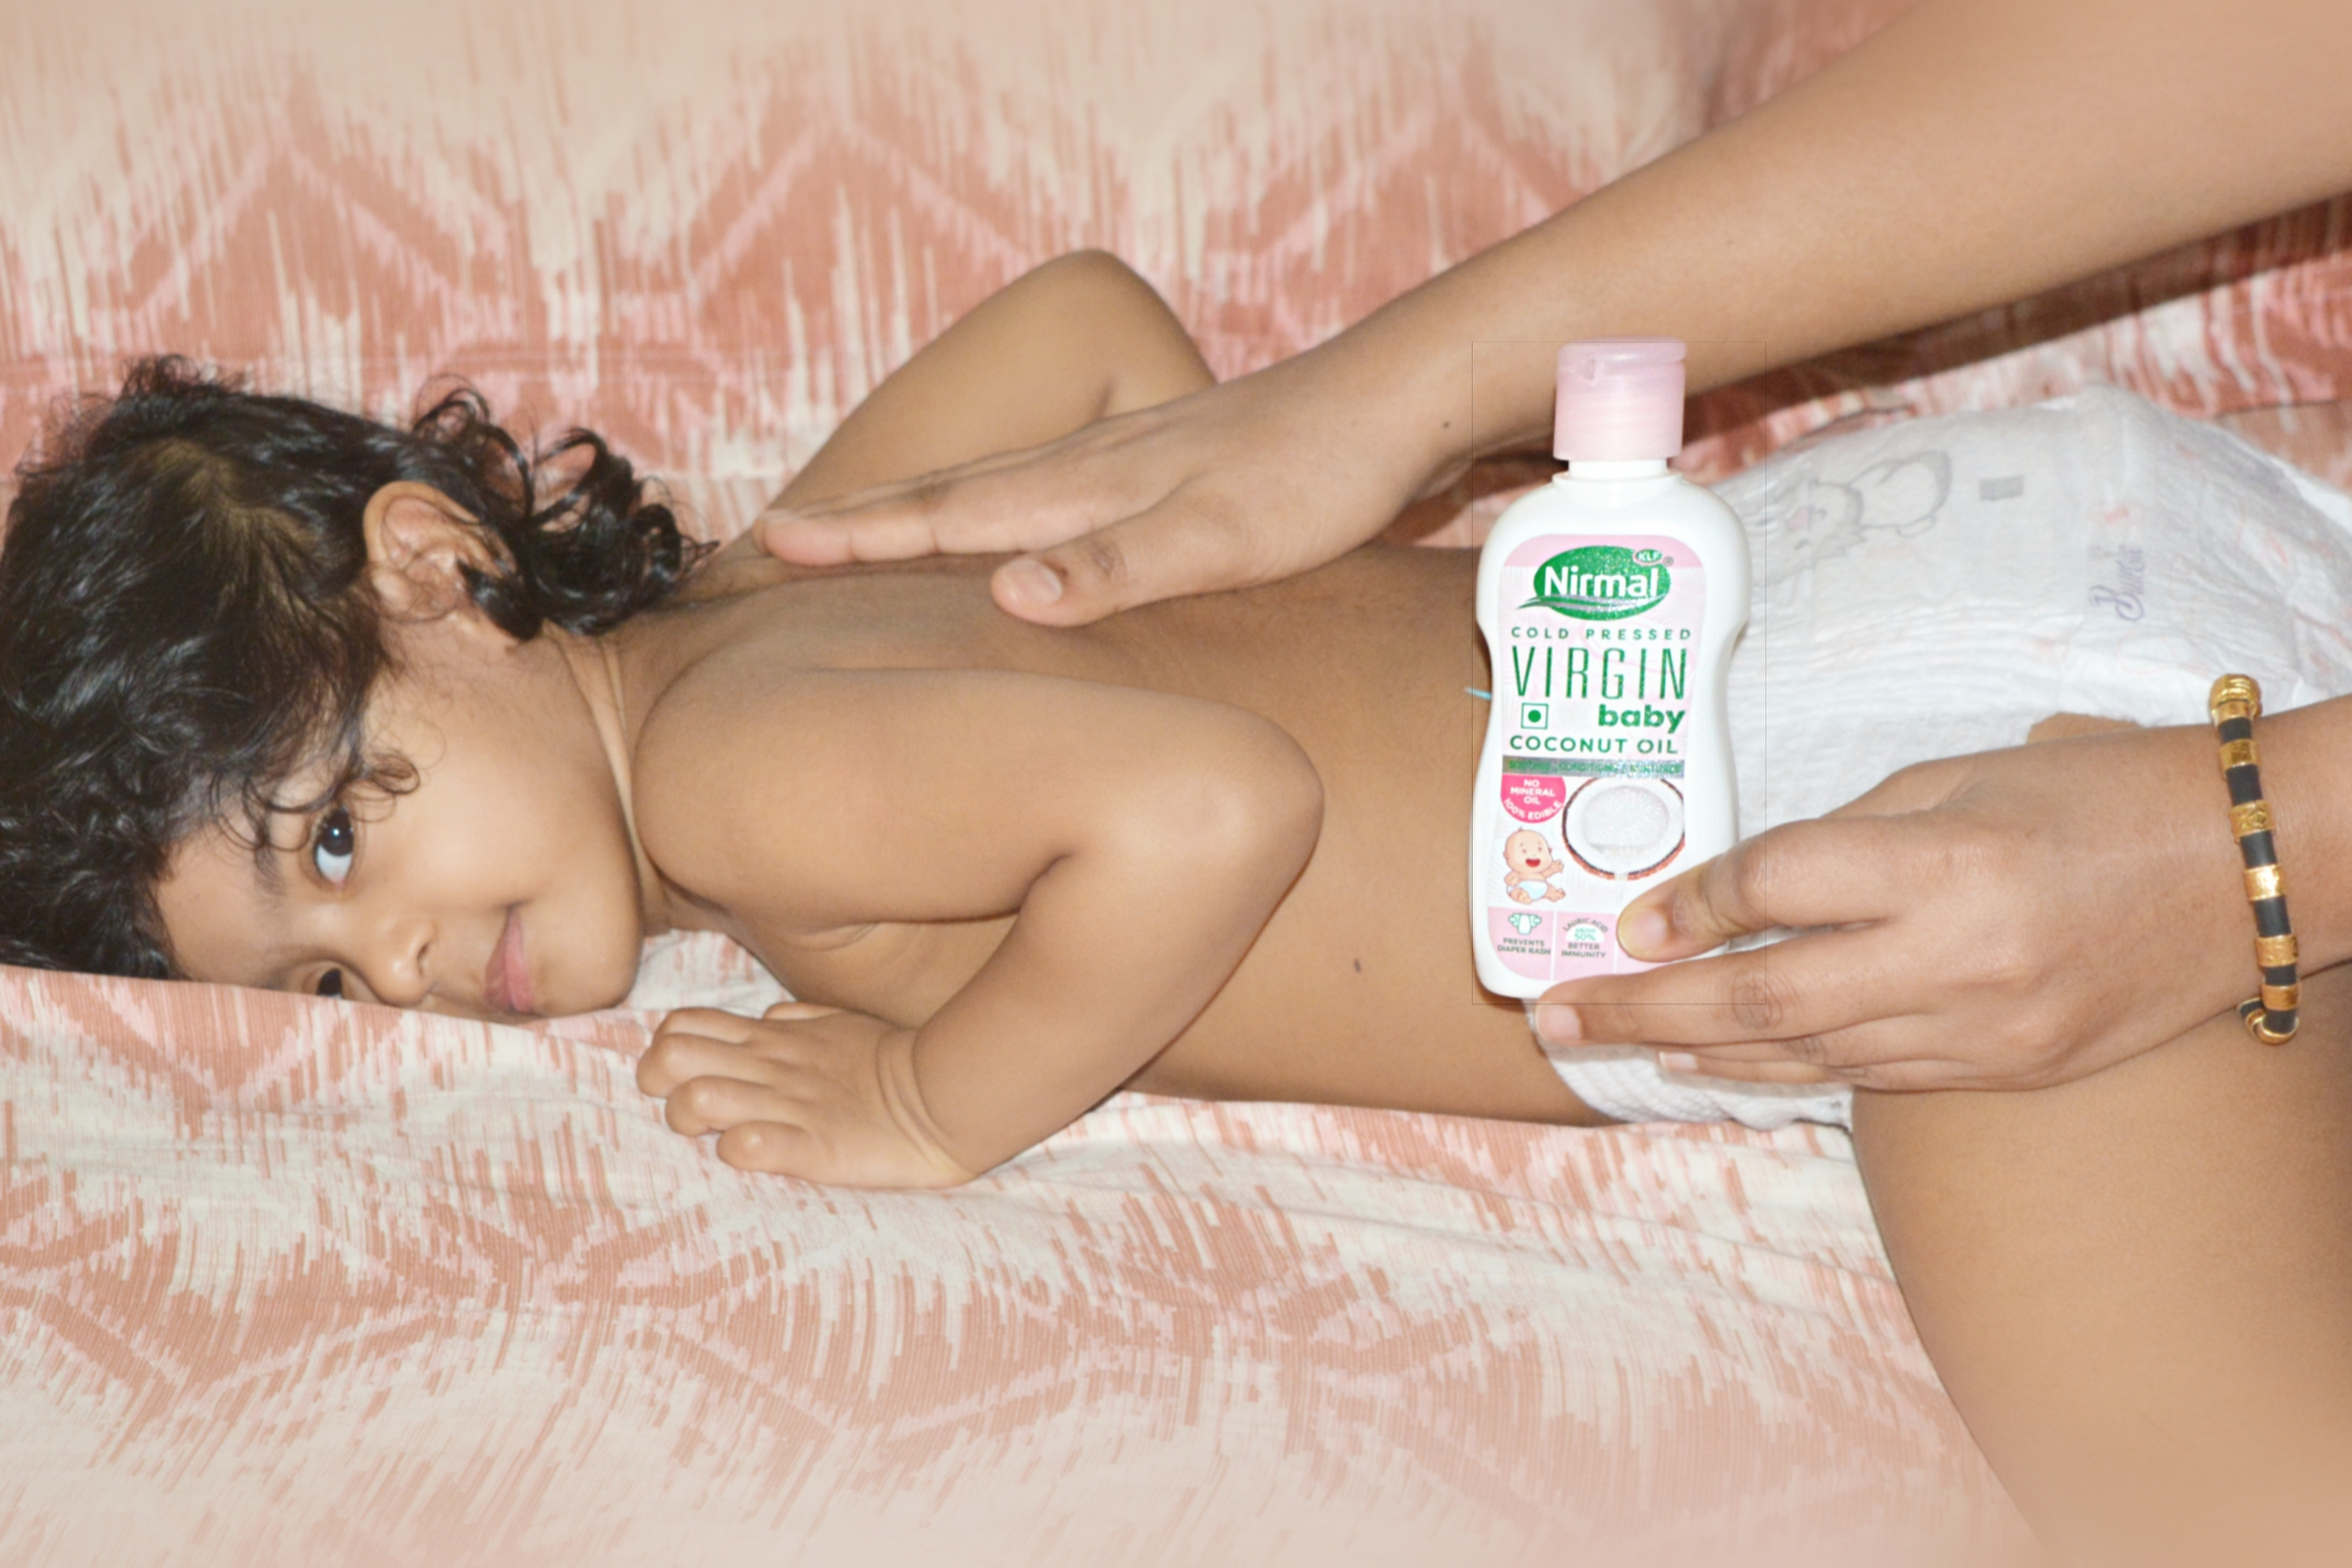 KLF Nirmal Cold Pressed Virgin Baby Coconut oil-Best Virgin Coconut Oil for babies-By meghanatulasi